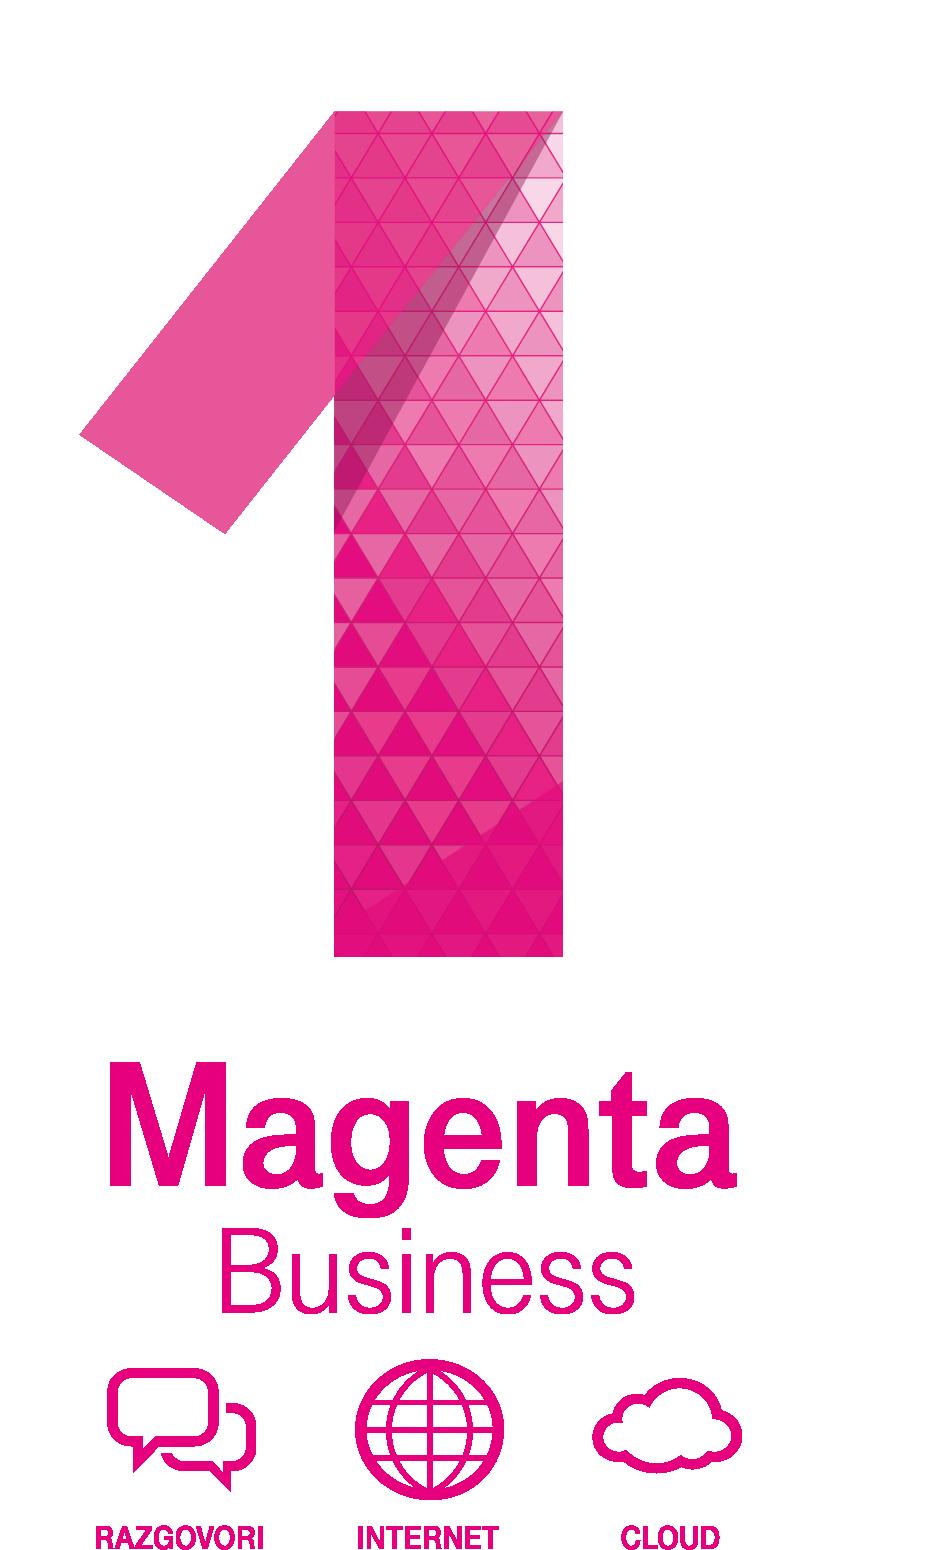 Magenta 1 Business